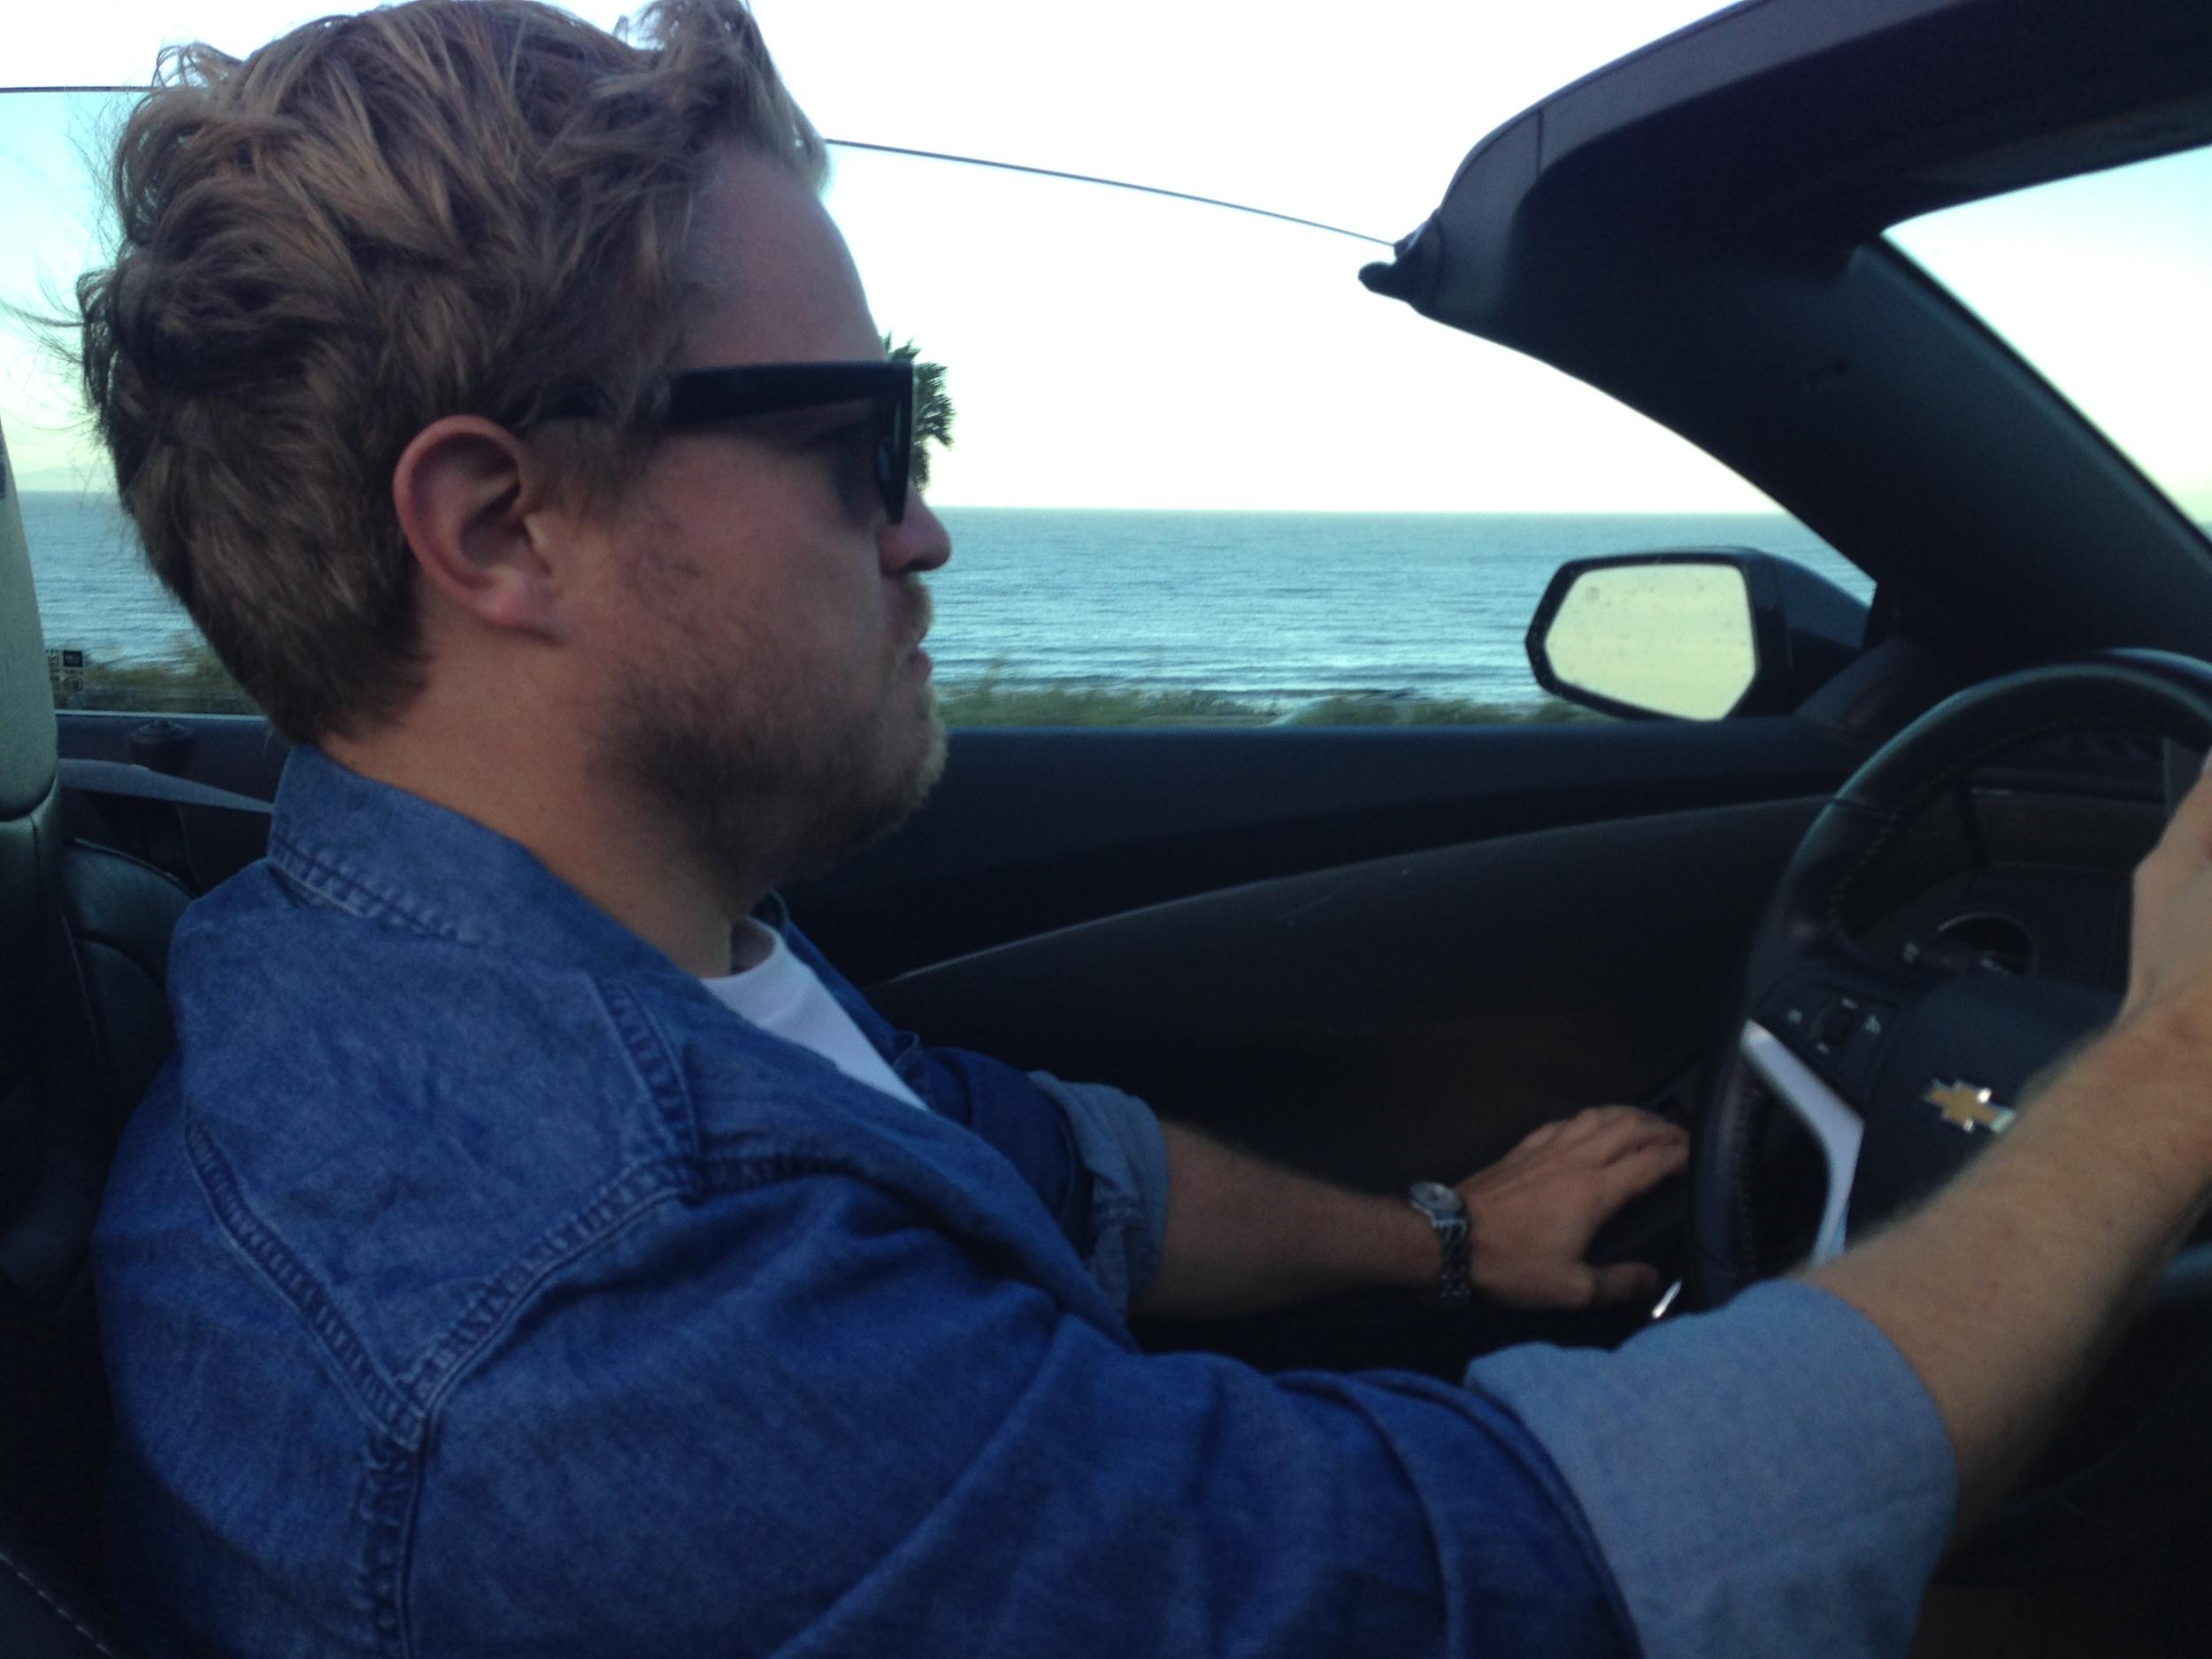 (Mr Jackson, aka prince charming, driving a convertible up the California coast.)